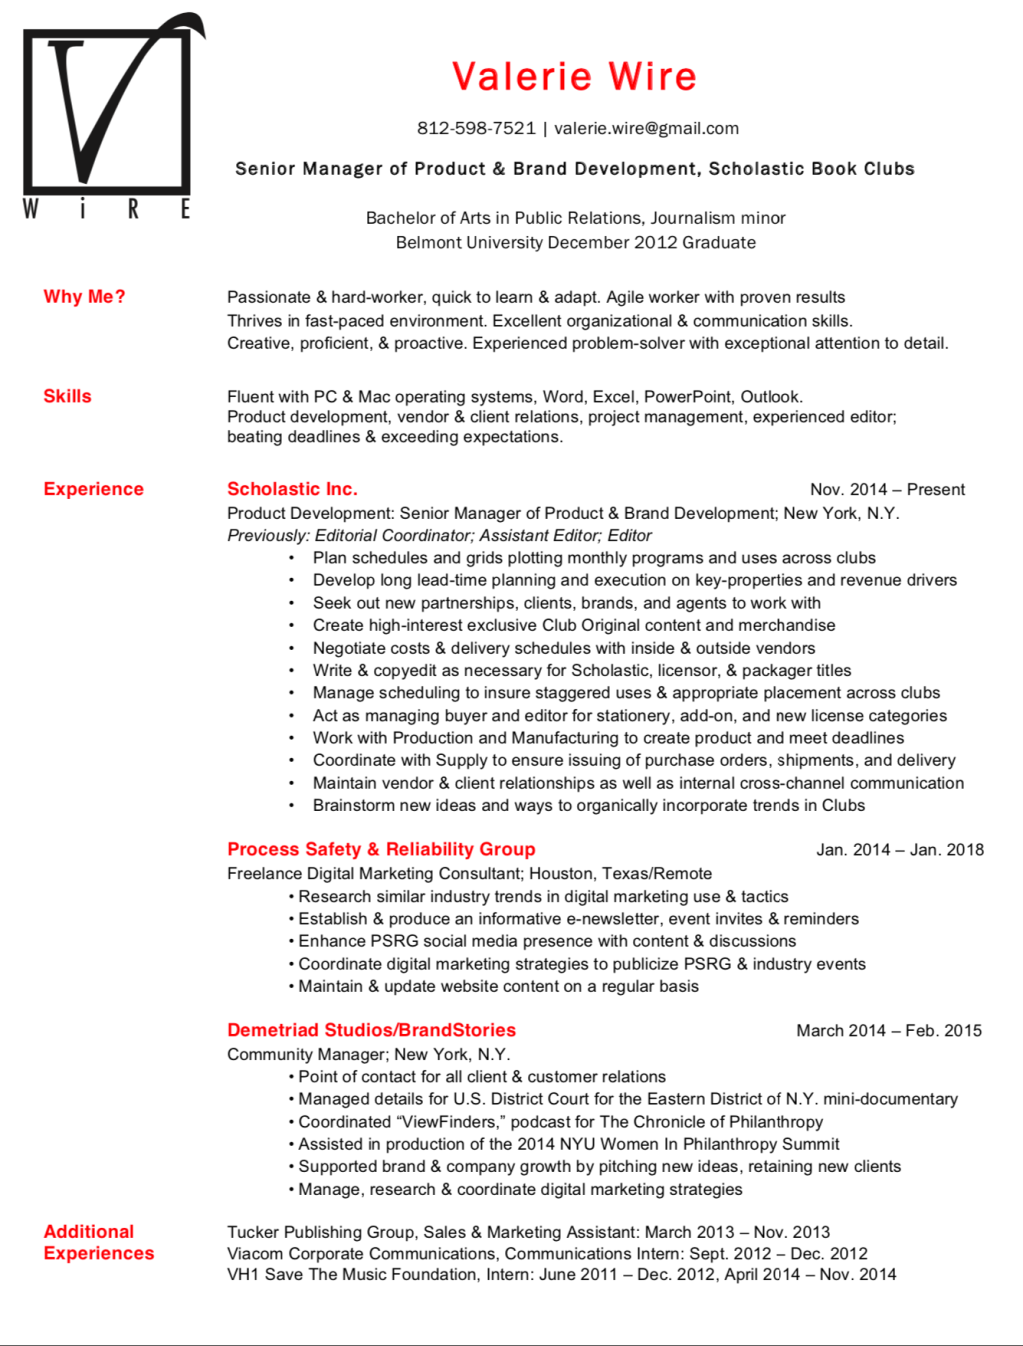 VWire Resume